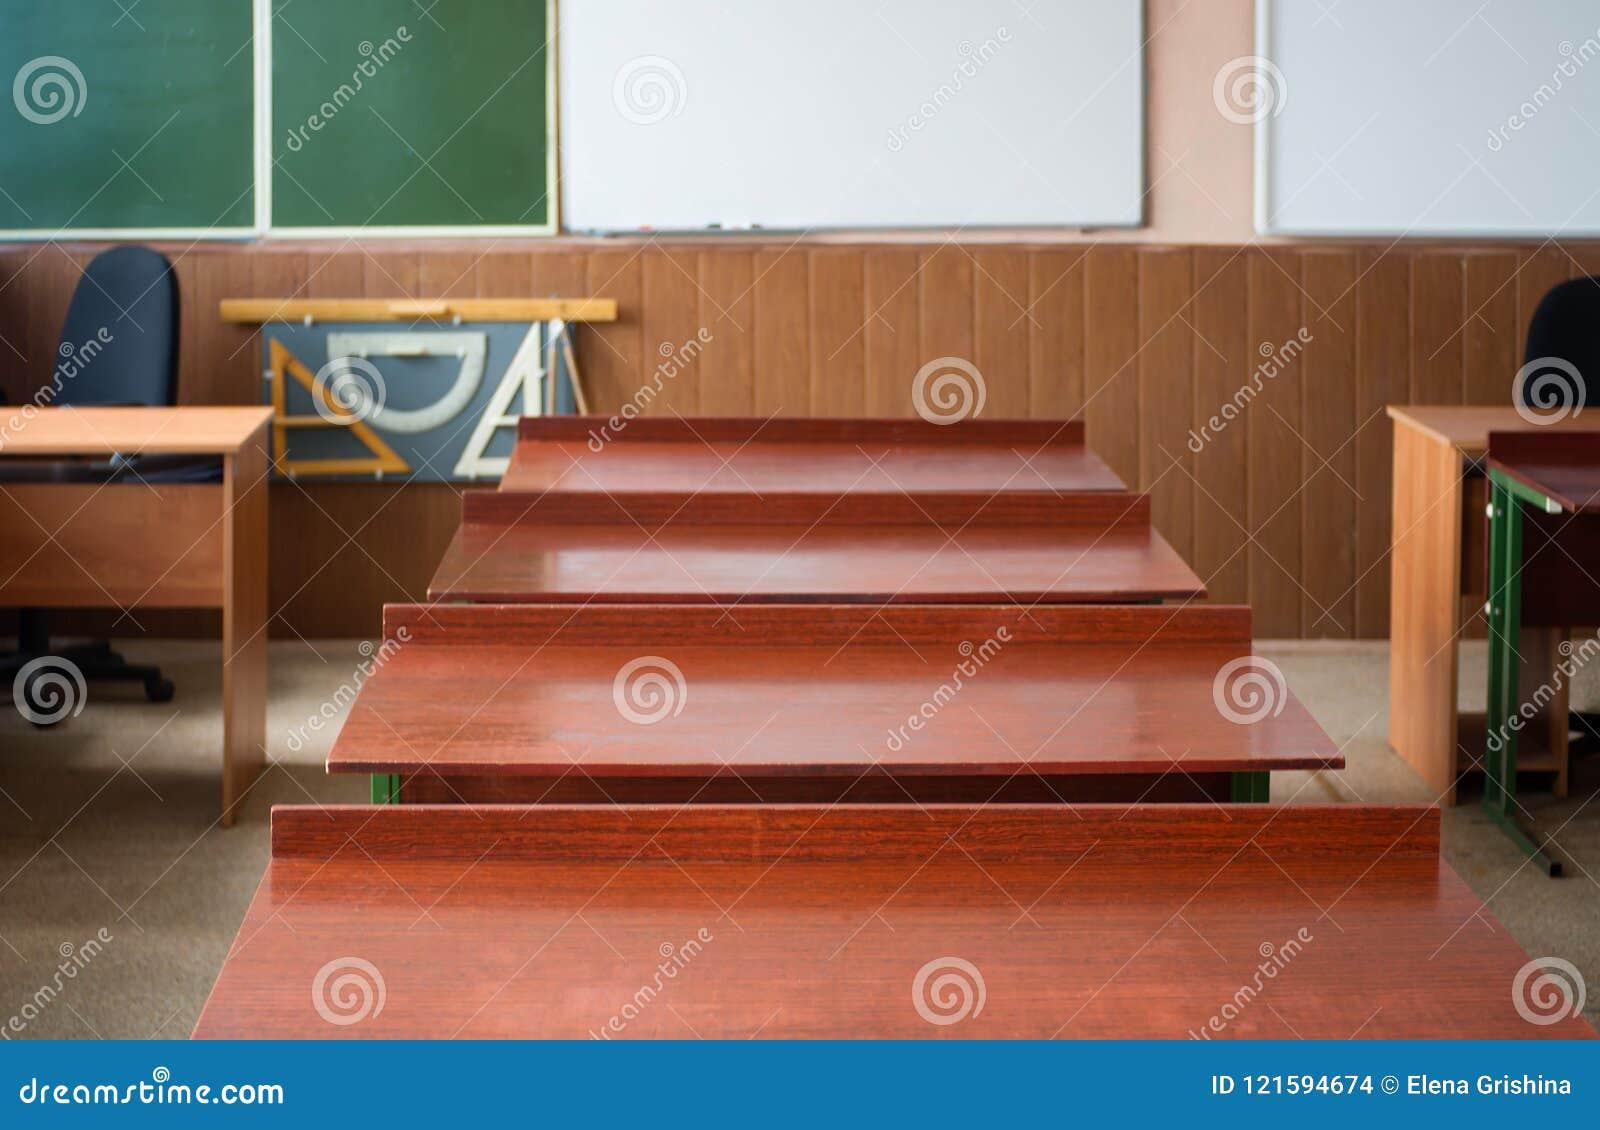 School Classroom With School Desks And Blackboard In High ...